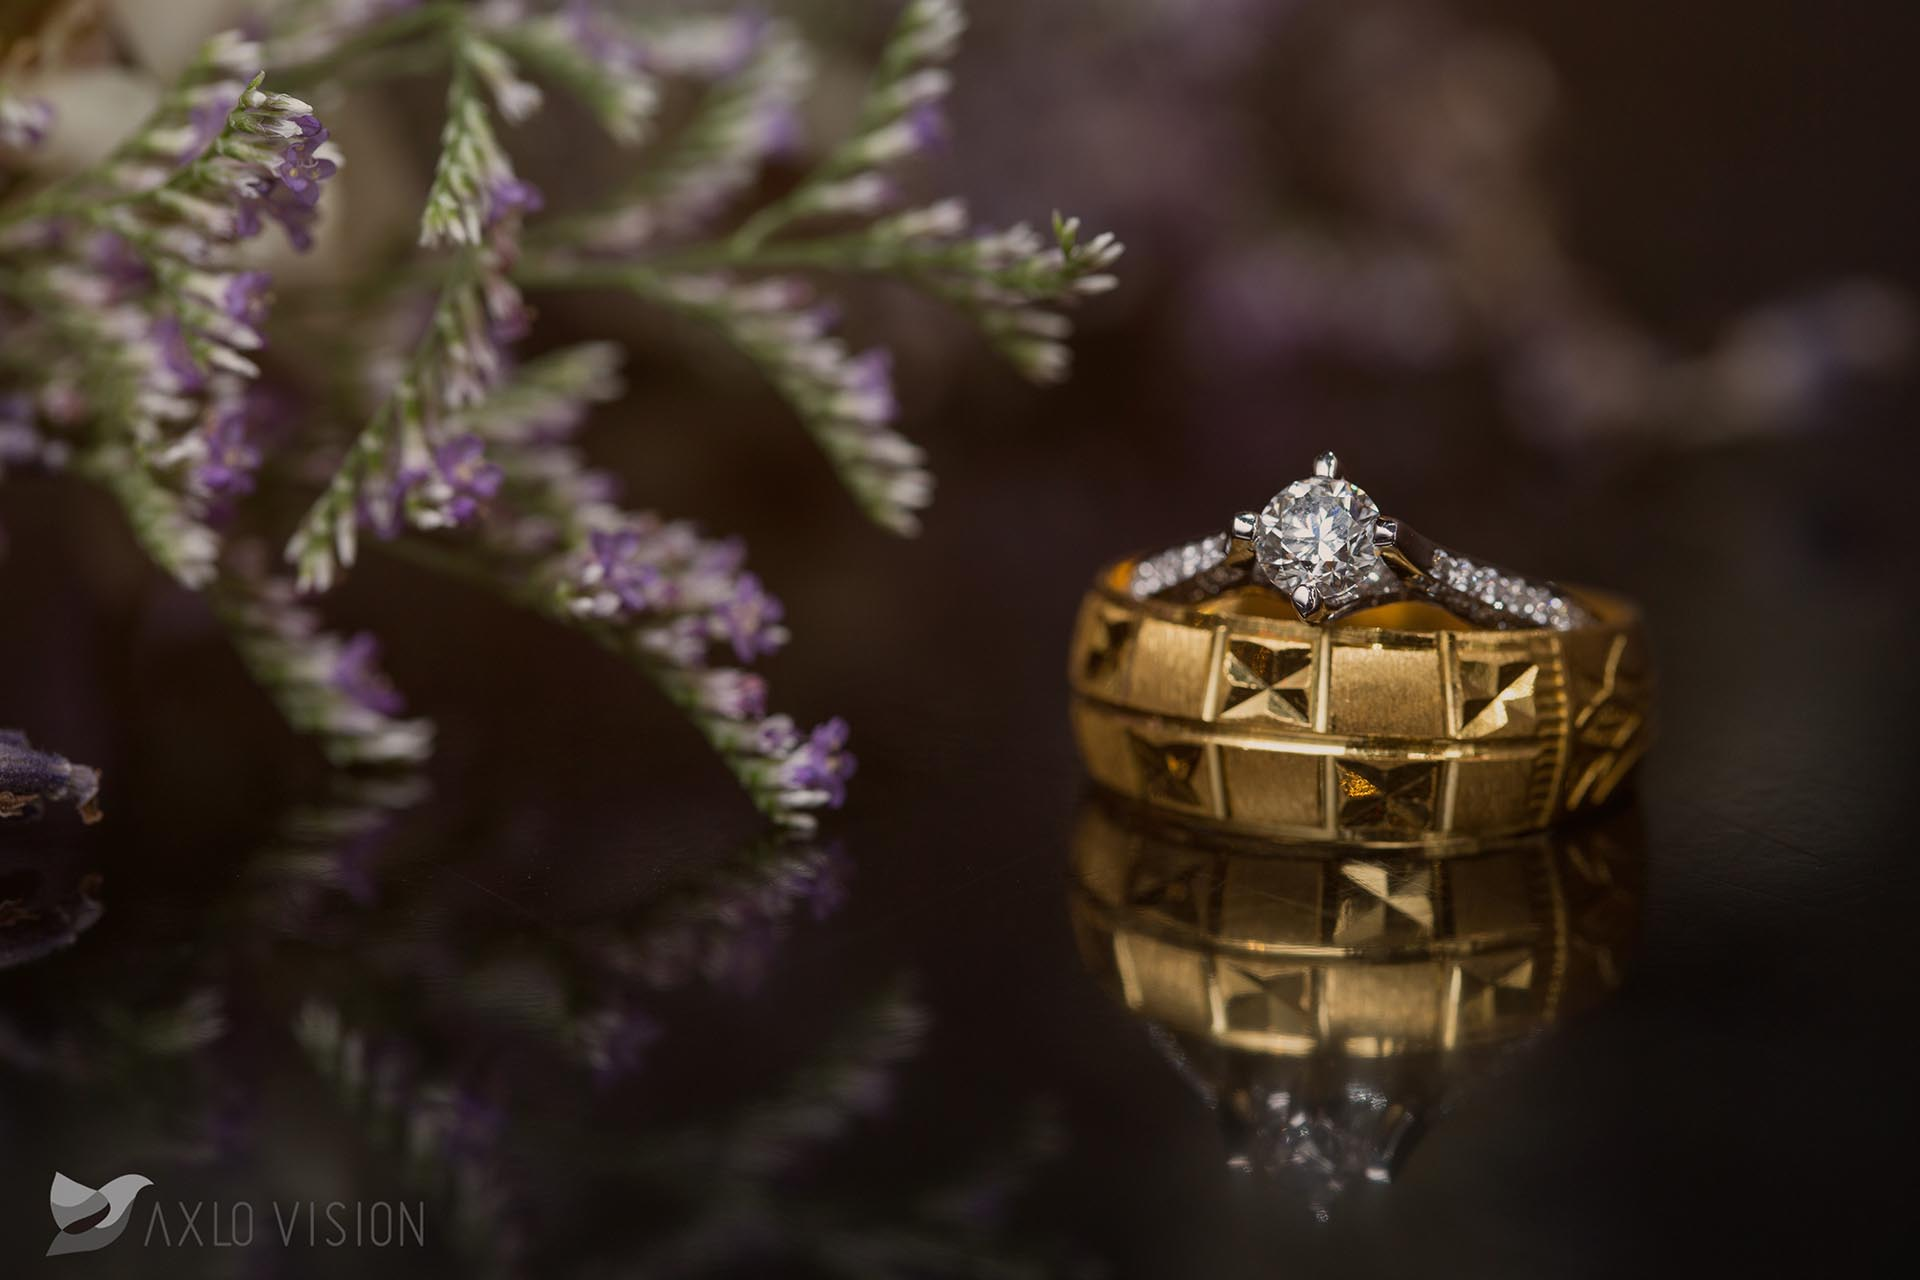 2017 AXLO web 首頁用 婚禮攝影_001